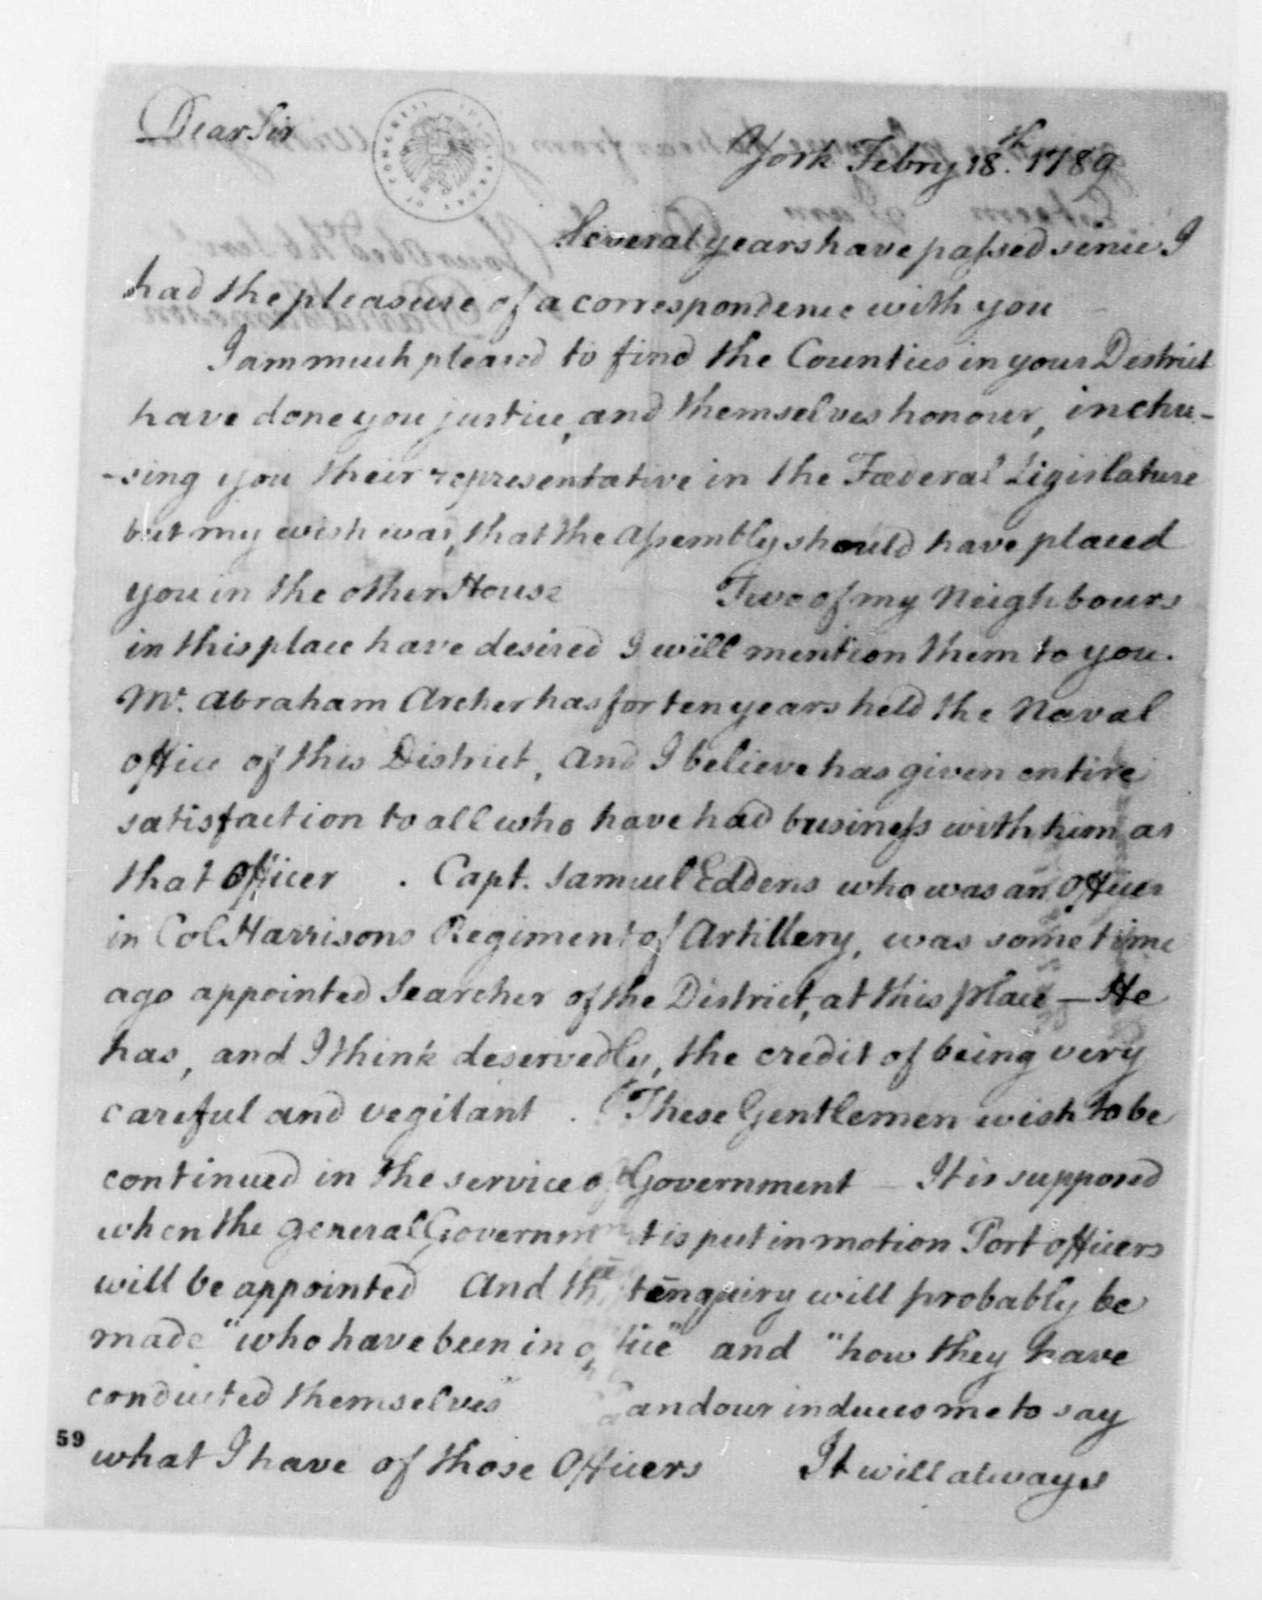 David Jameson to James Madison, February 18, 1789.